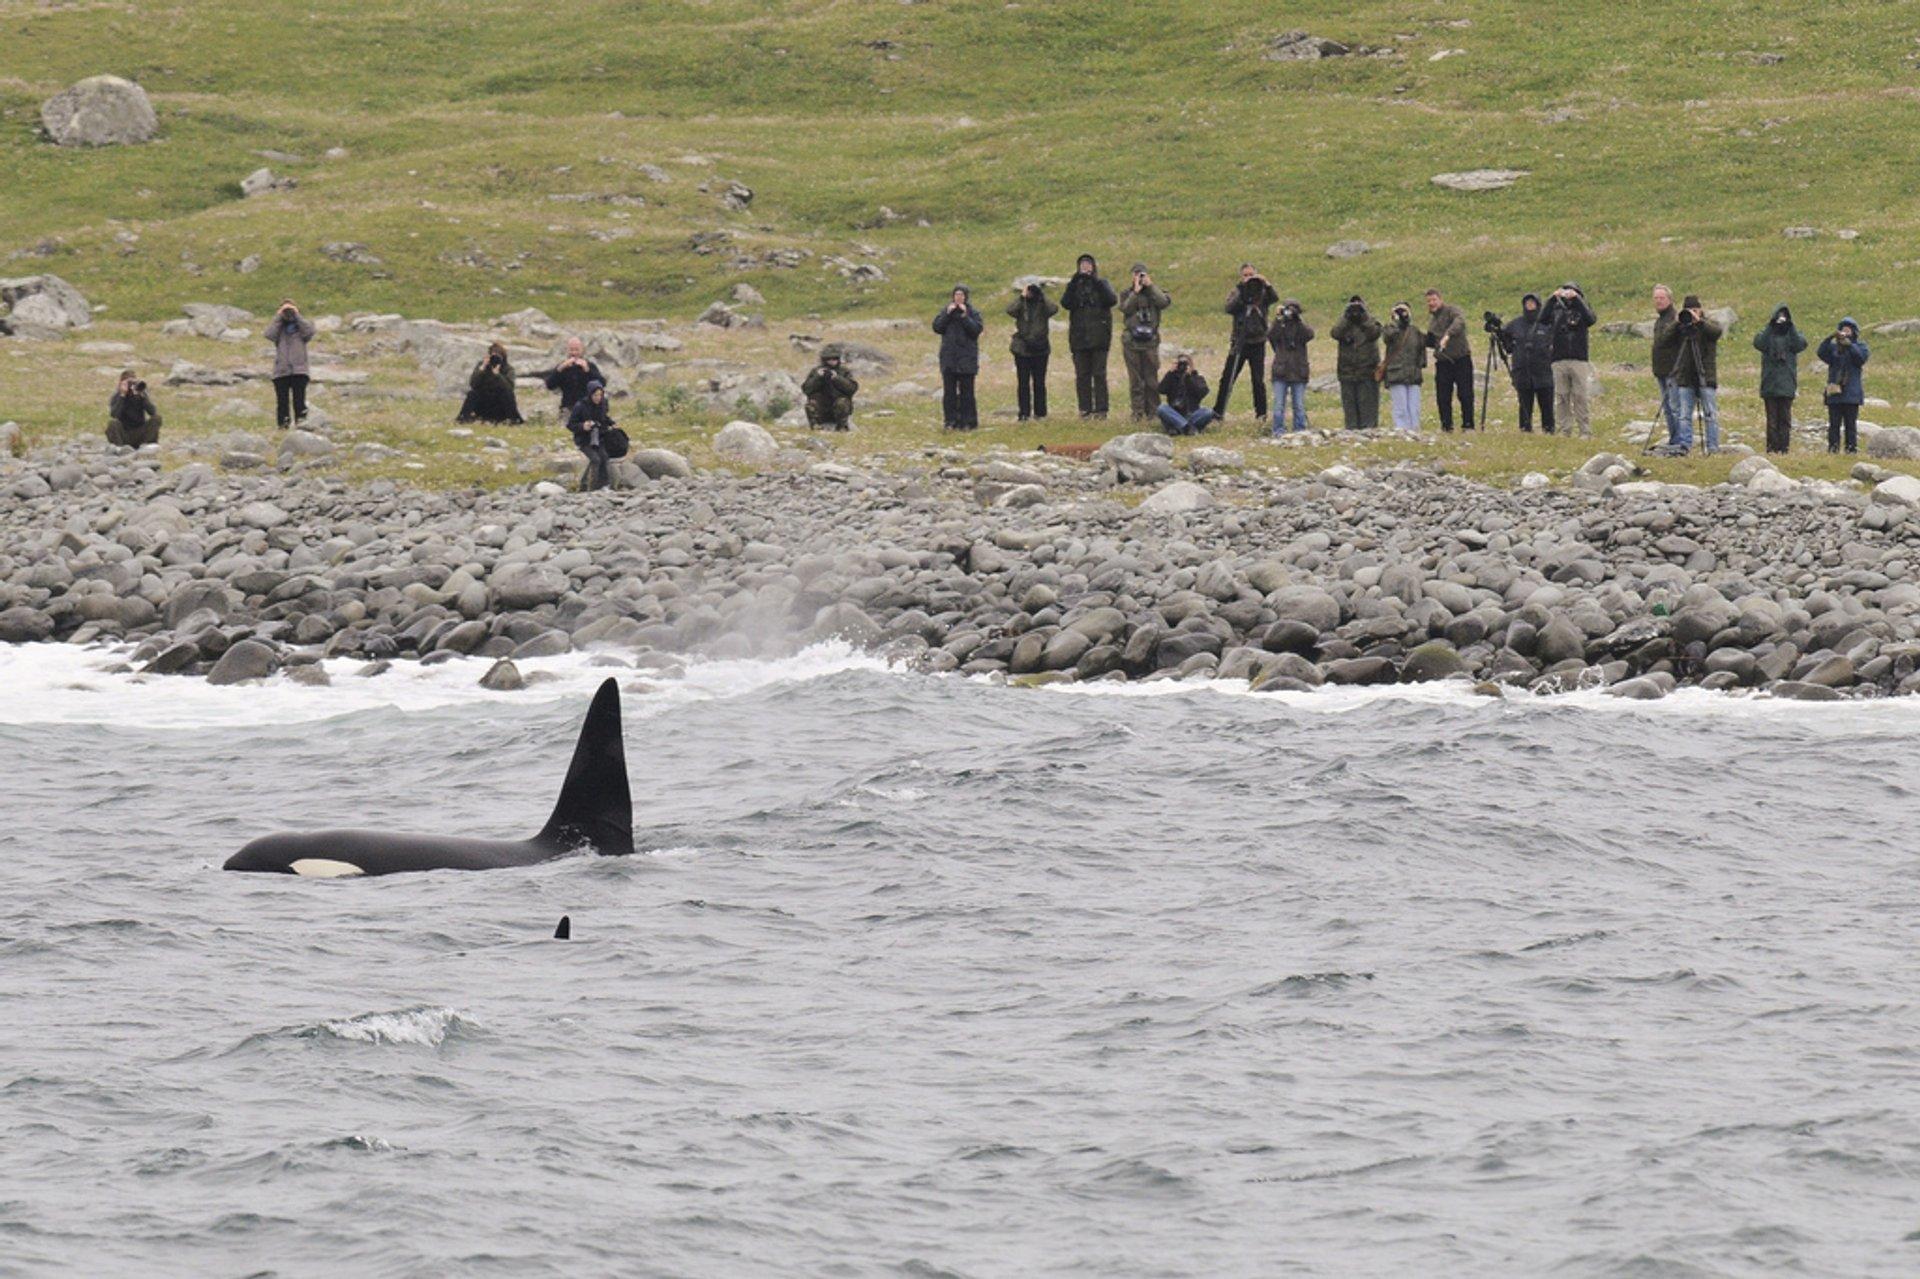 Orca near Shetland coastline 2020